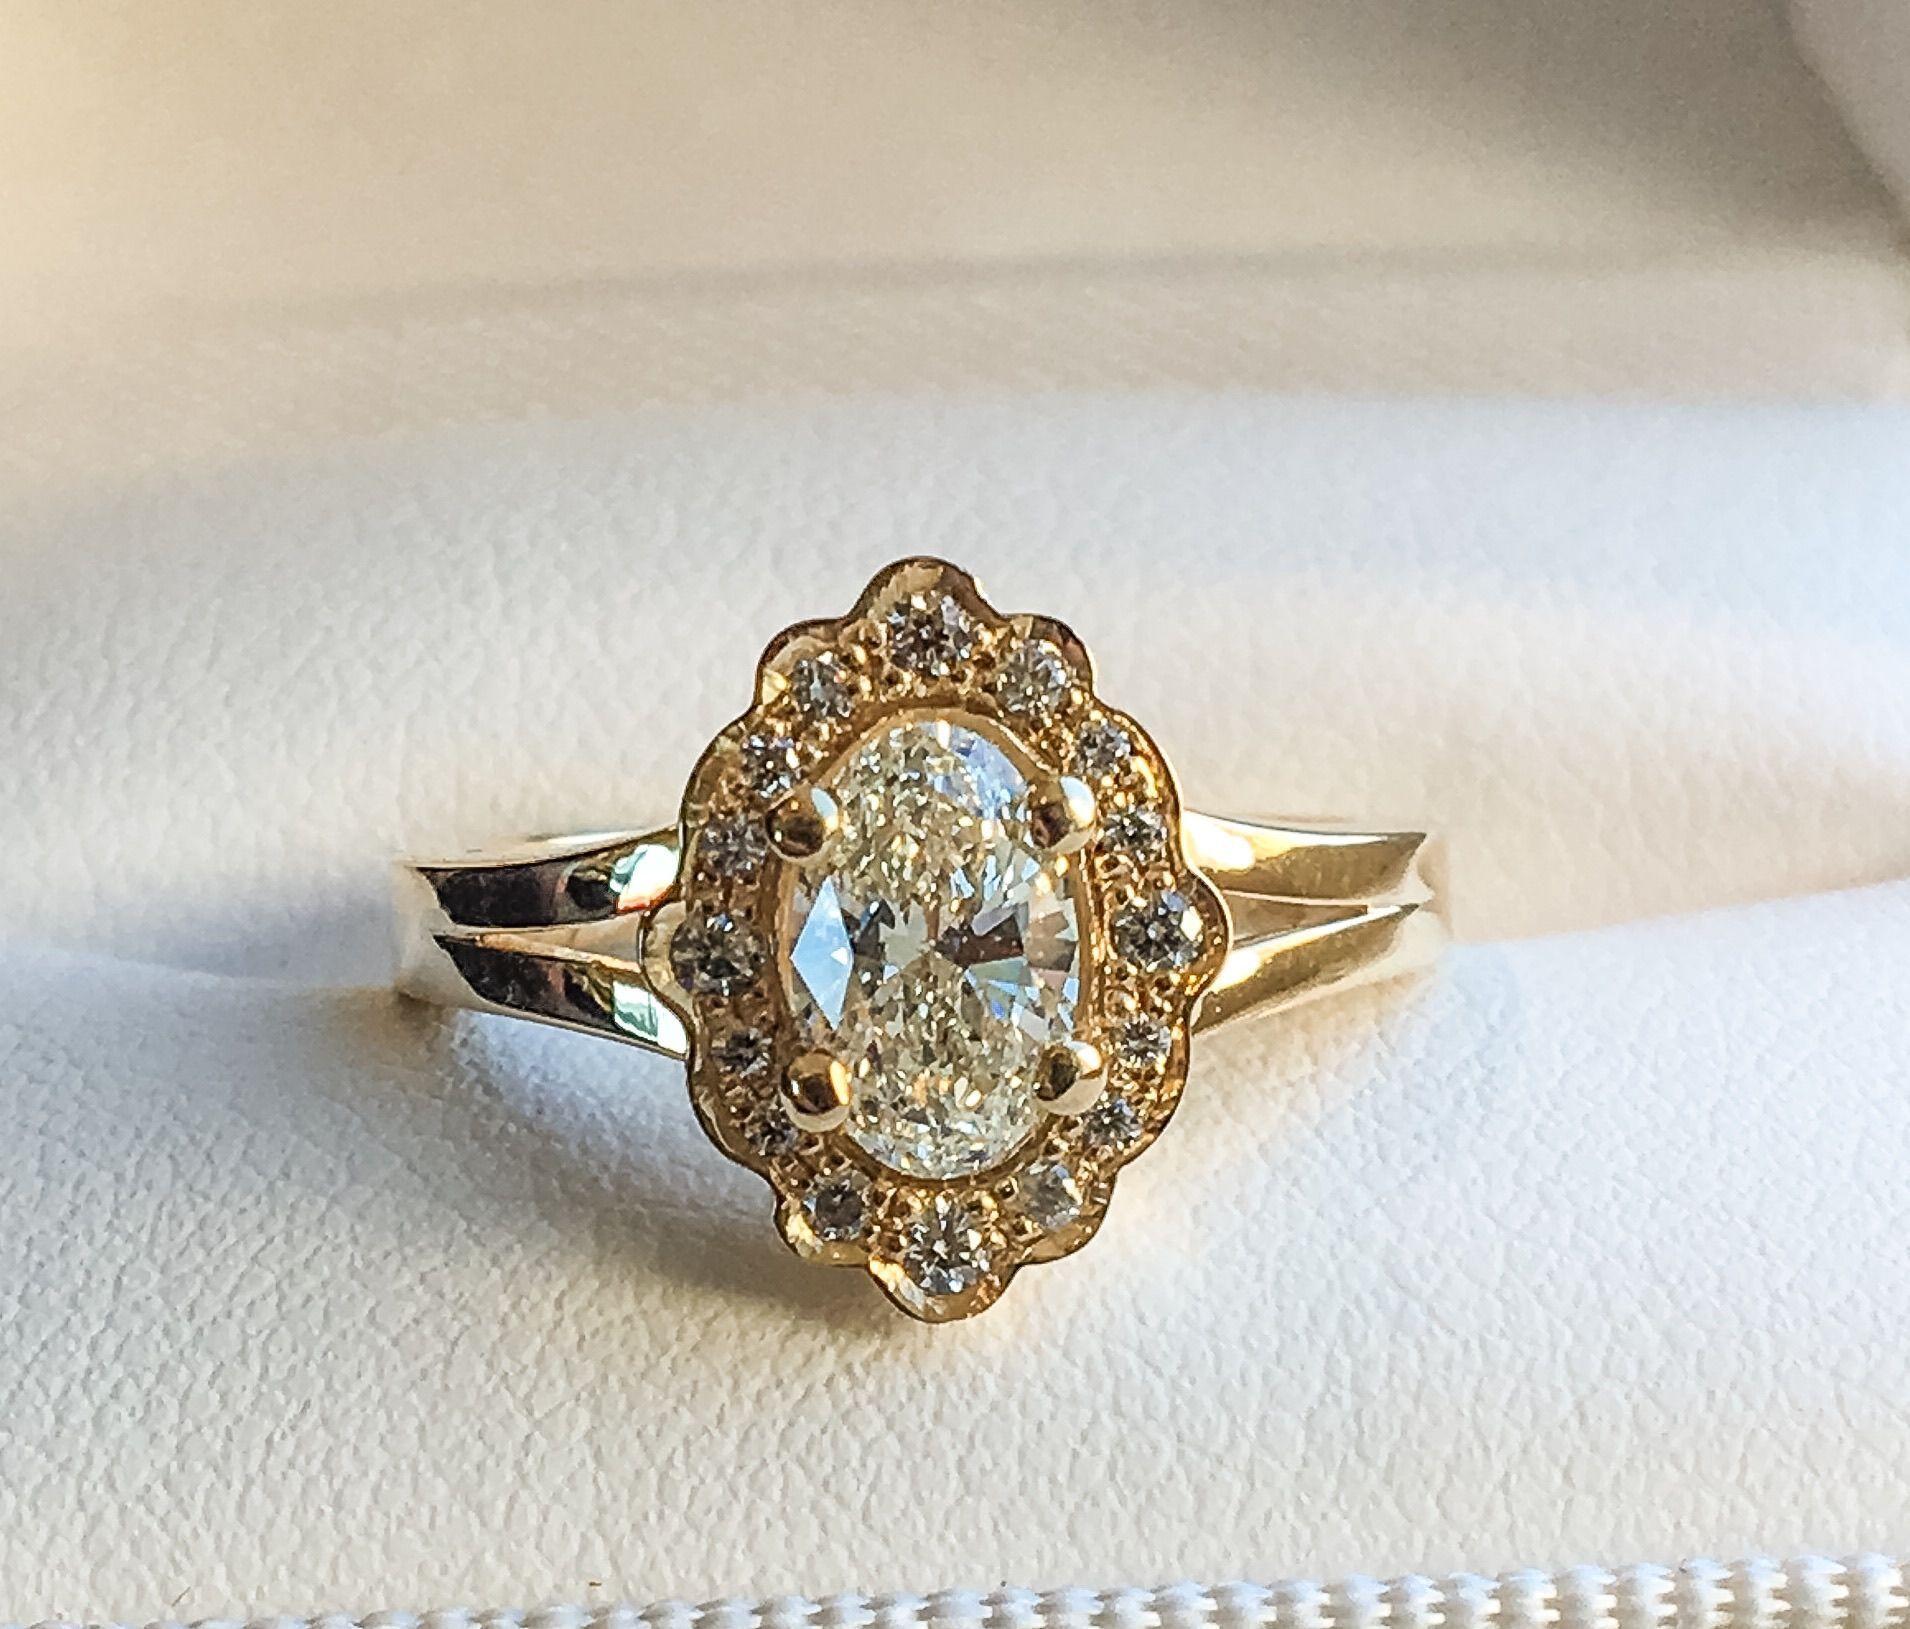 Custom Made 14k Yellow Gold Unique Halo Style Engagement Ring Set